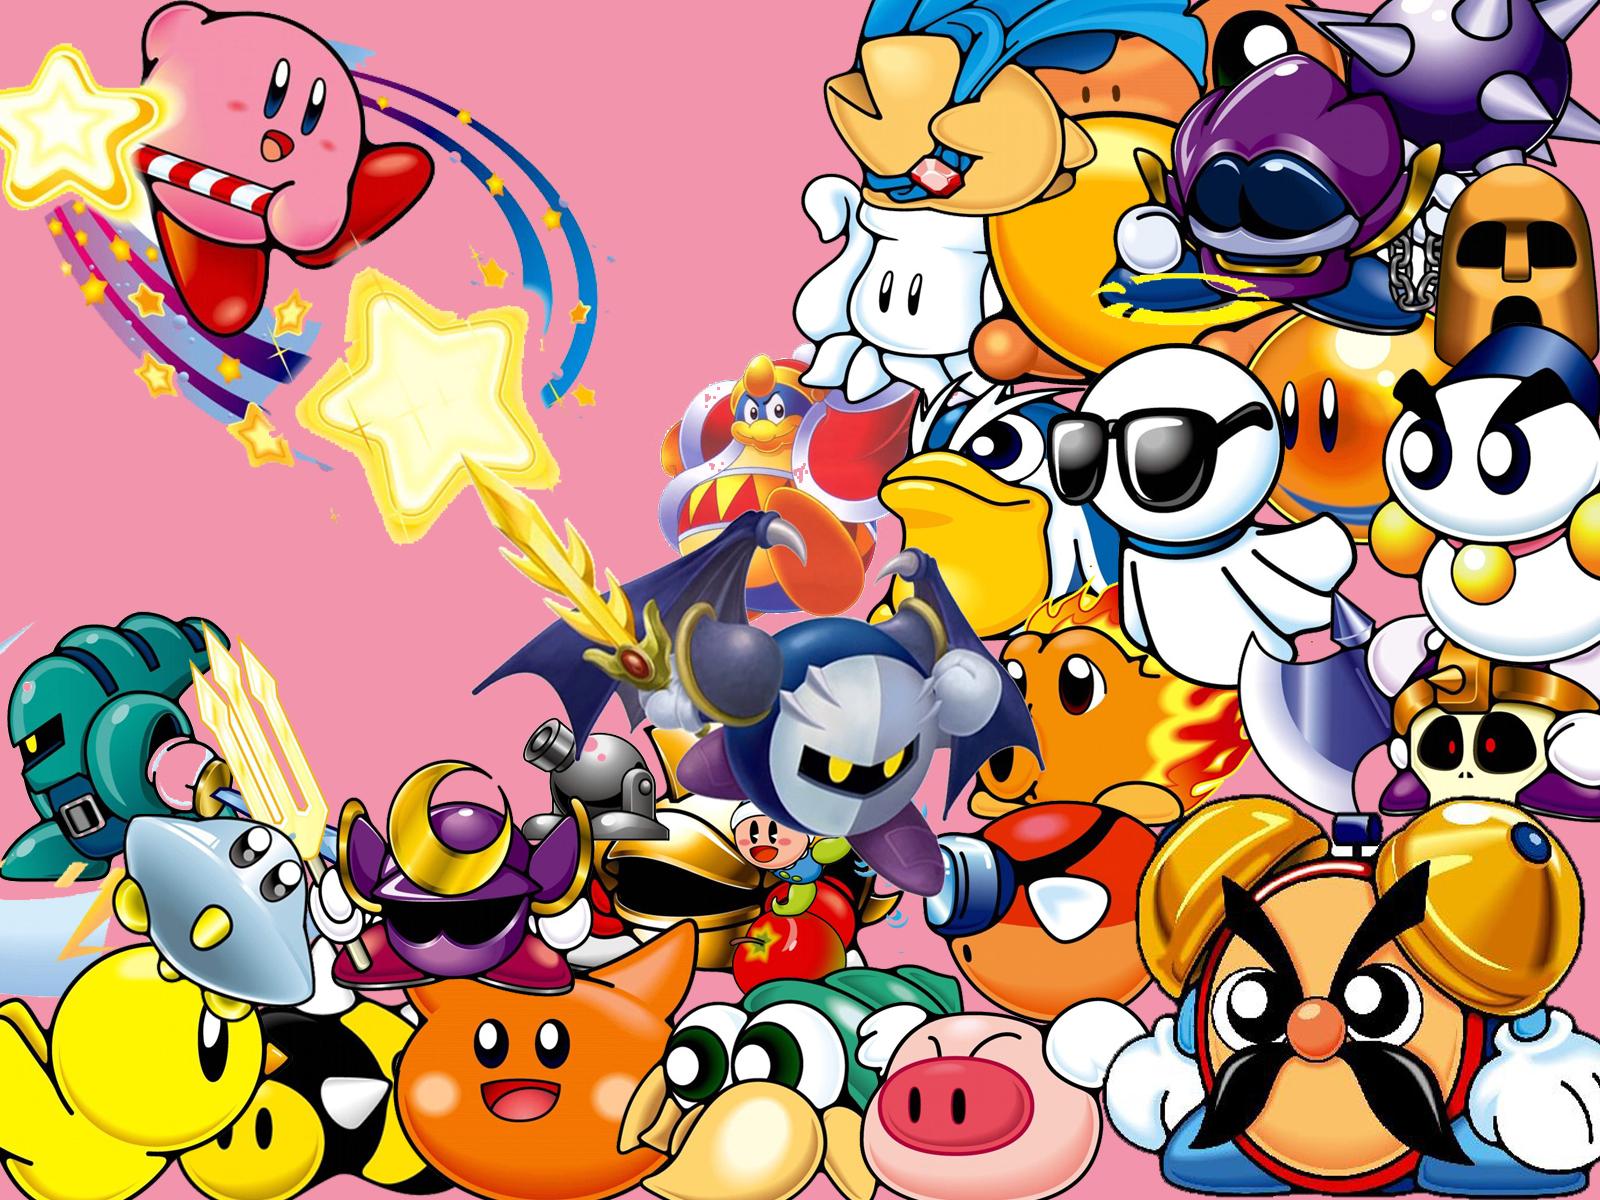 Kirby Nightmare in Dreamland by lamauvaiseherbe on DeviantArt